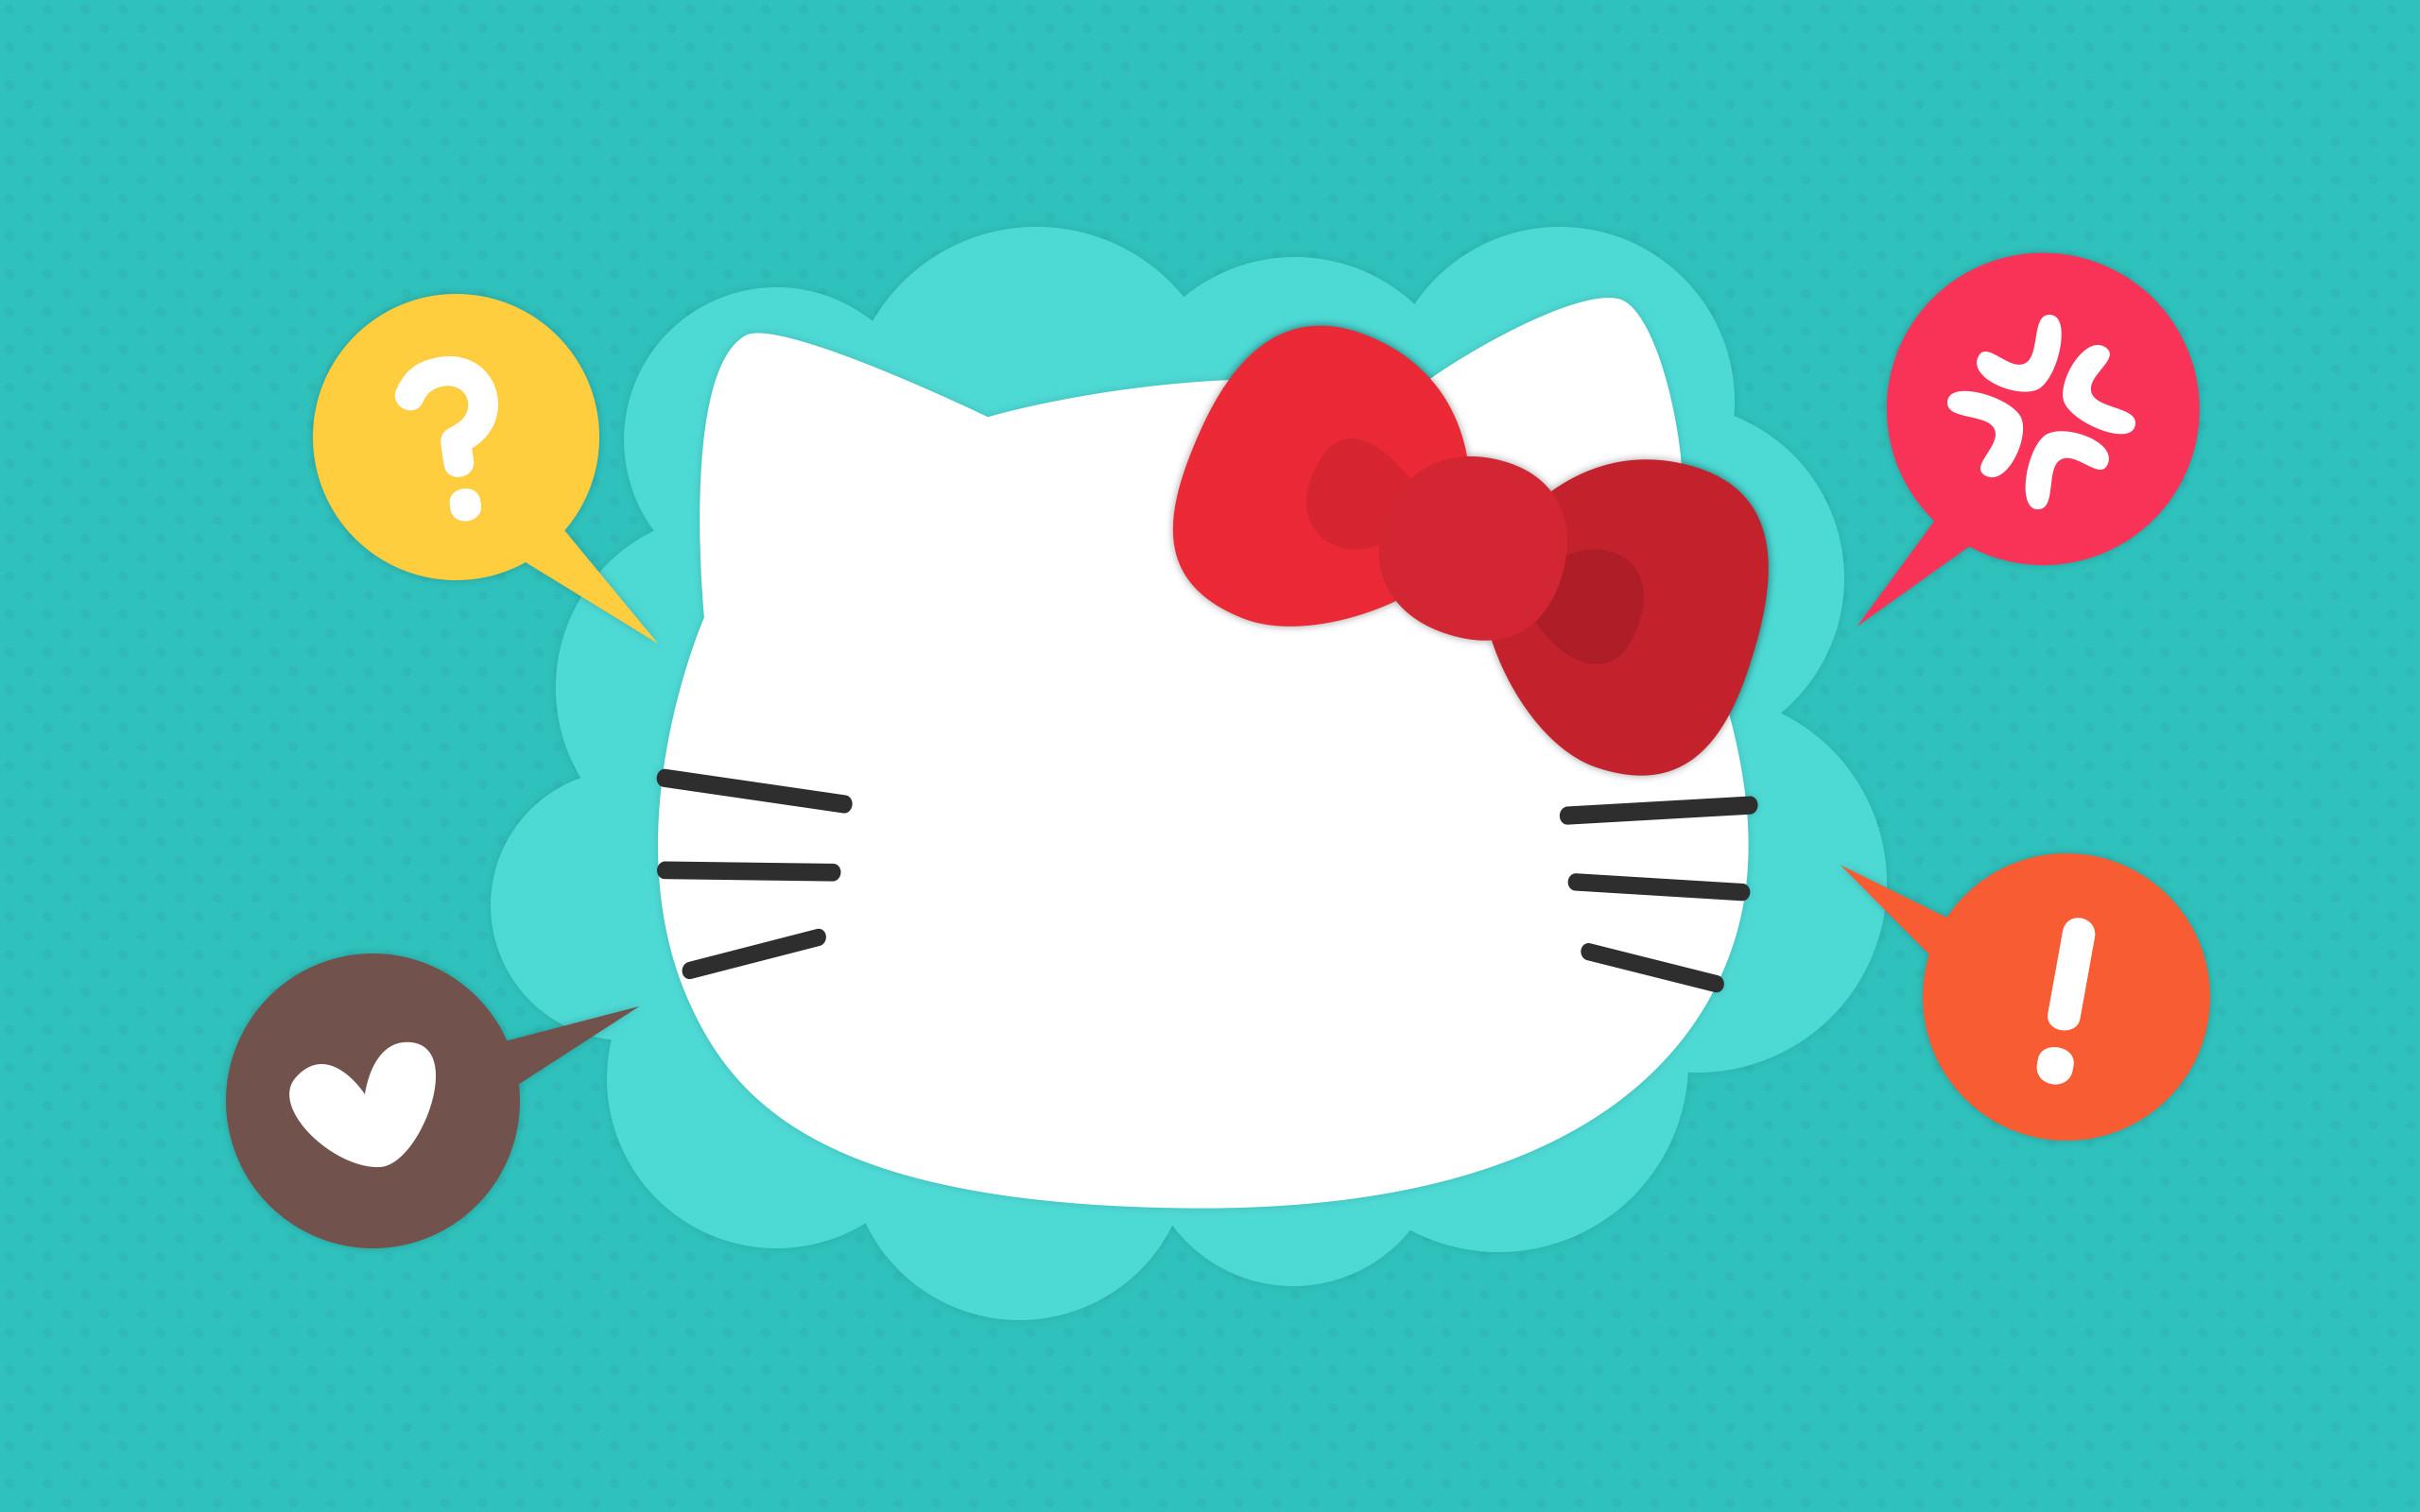 Great Wallpaper Hello Kitty Desktop Background - 715404-hello-kitty-desktop-backgrounds-2560x1600-for-ios  Snapshot_347652.jpg